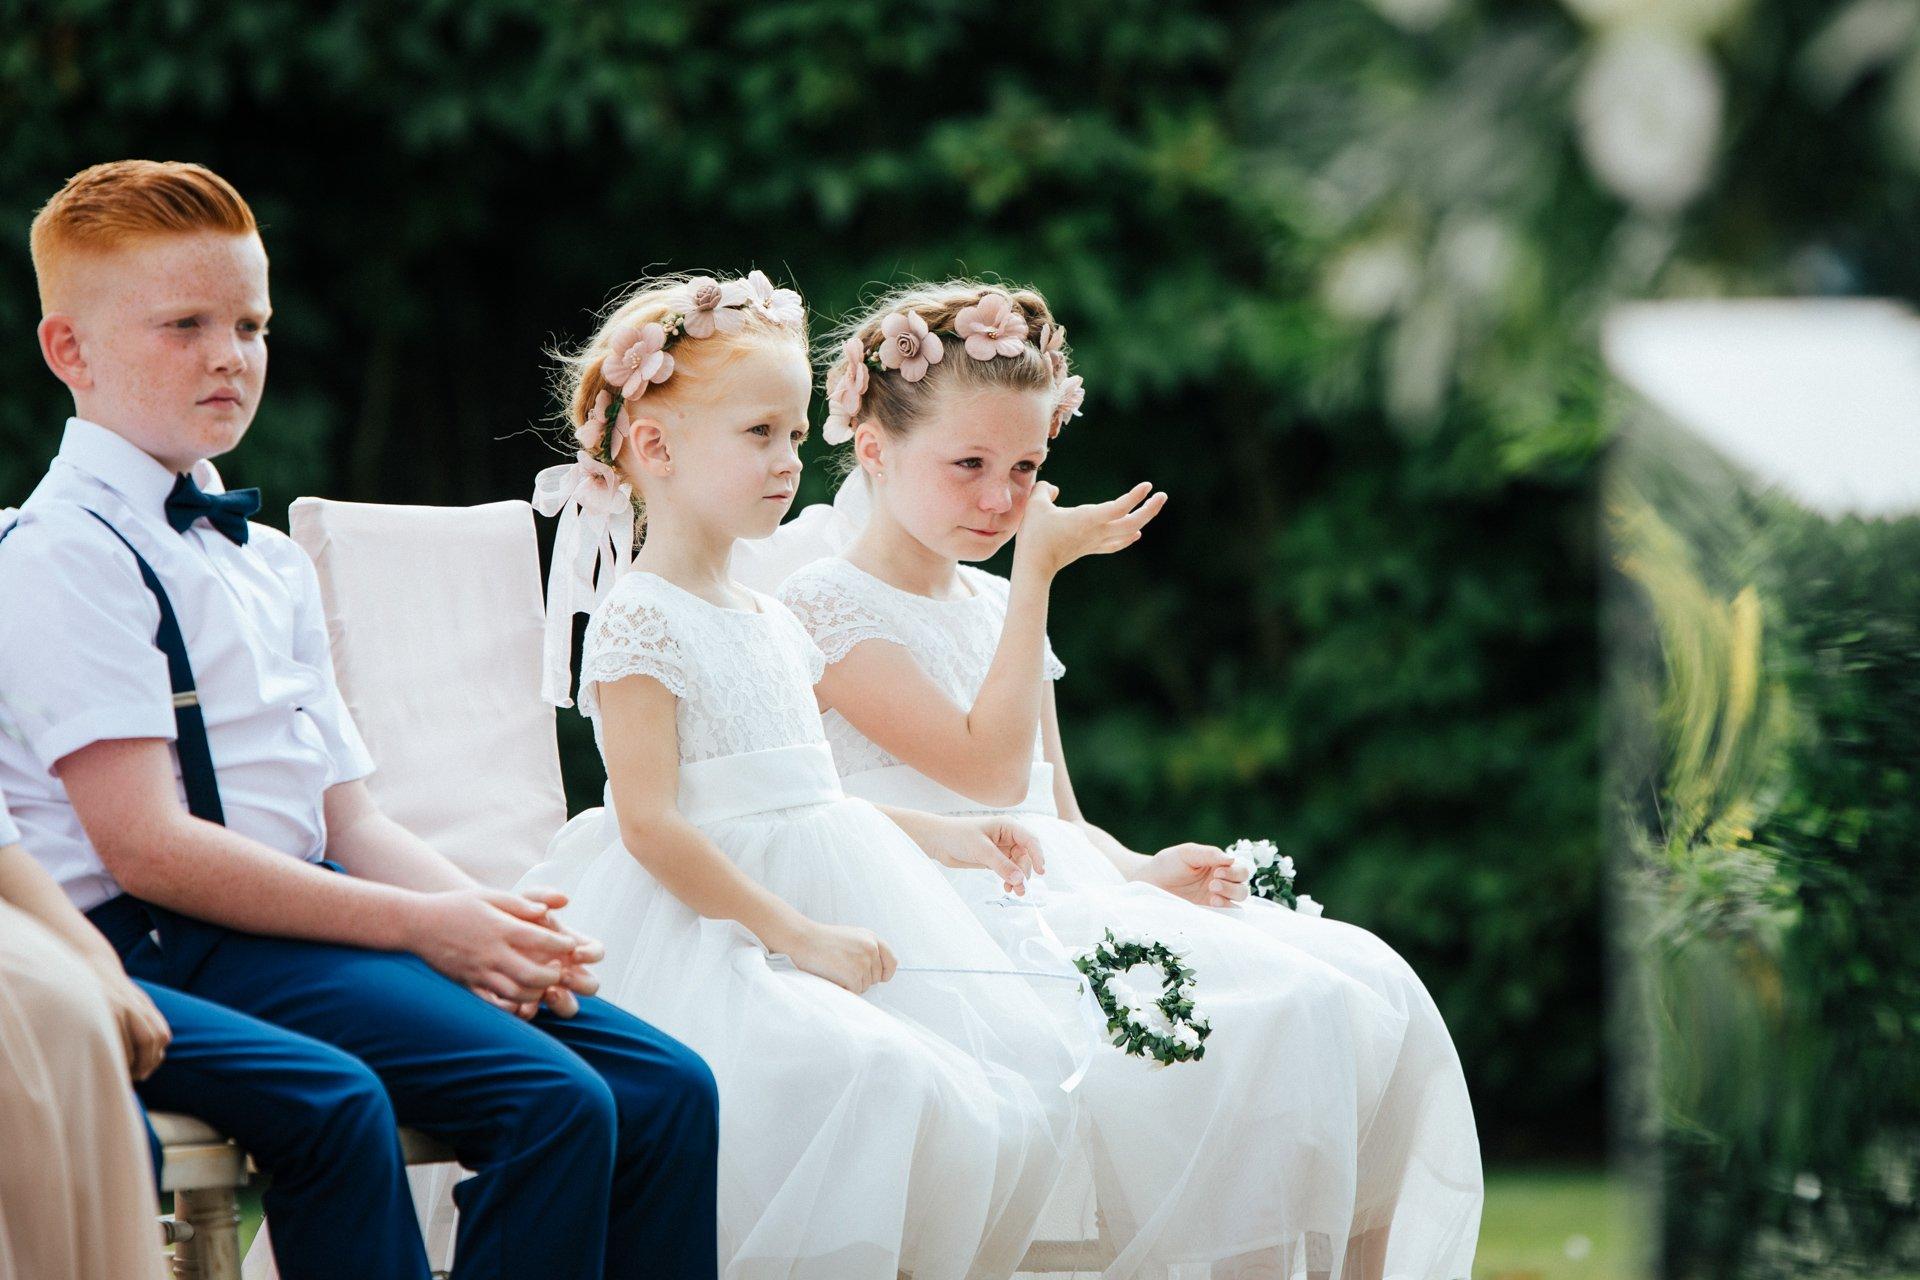 Natural moment capturing a bridesmaid wiping a tear away